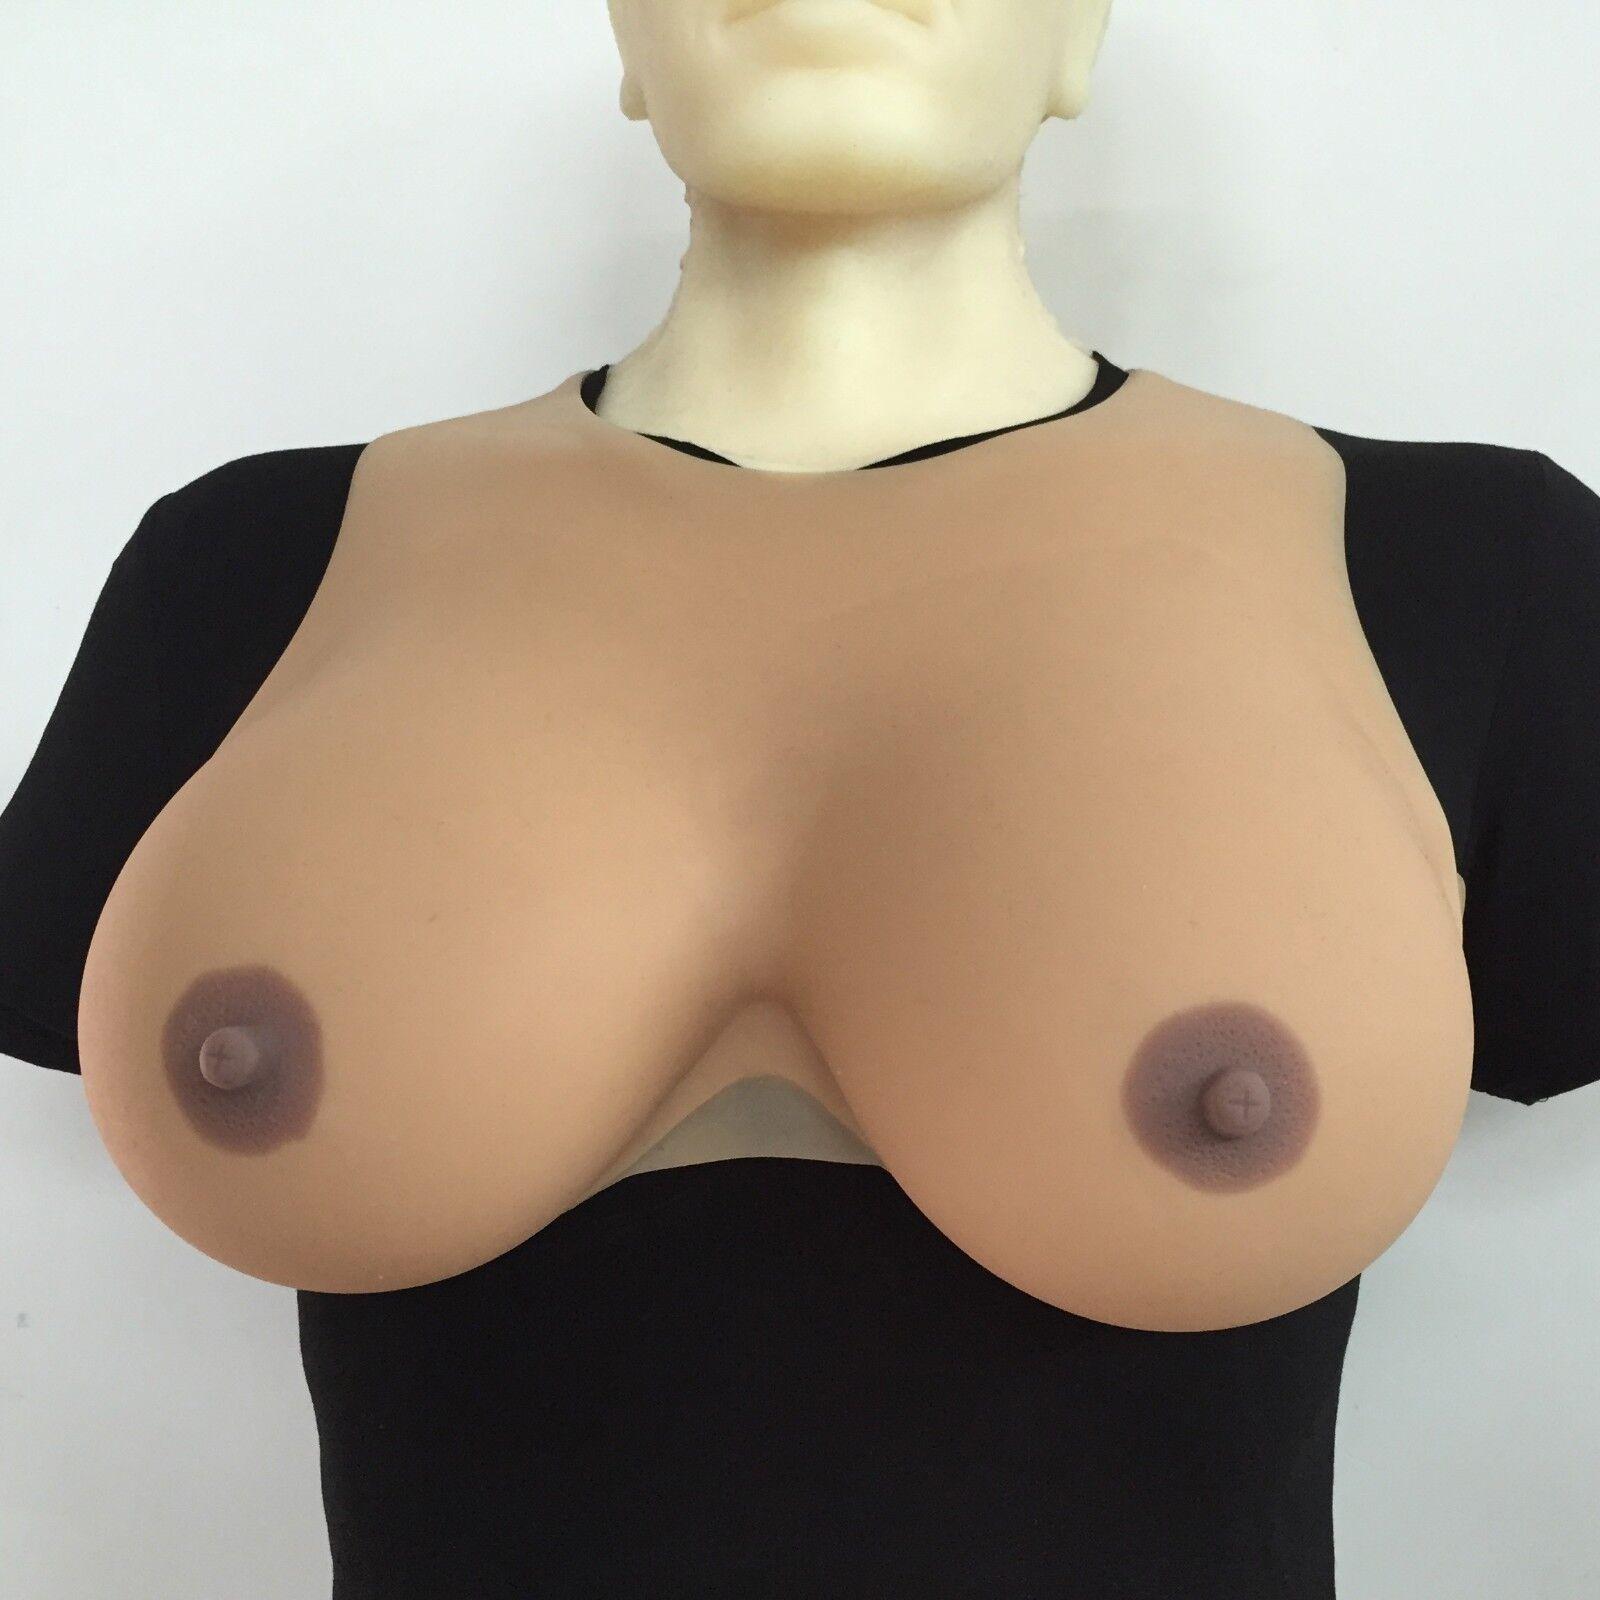 Silicona Crossdresser formas del pecho transgénegro falsas Boobs  Drag Queen 2400g pair  entrega rápida